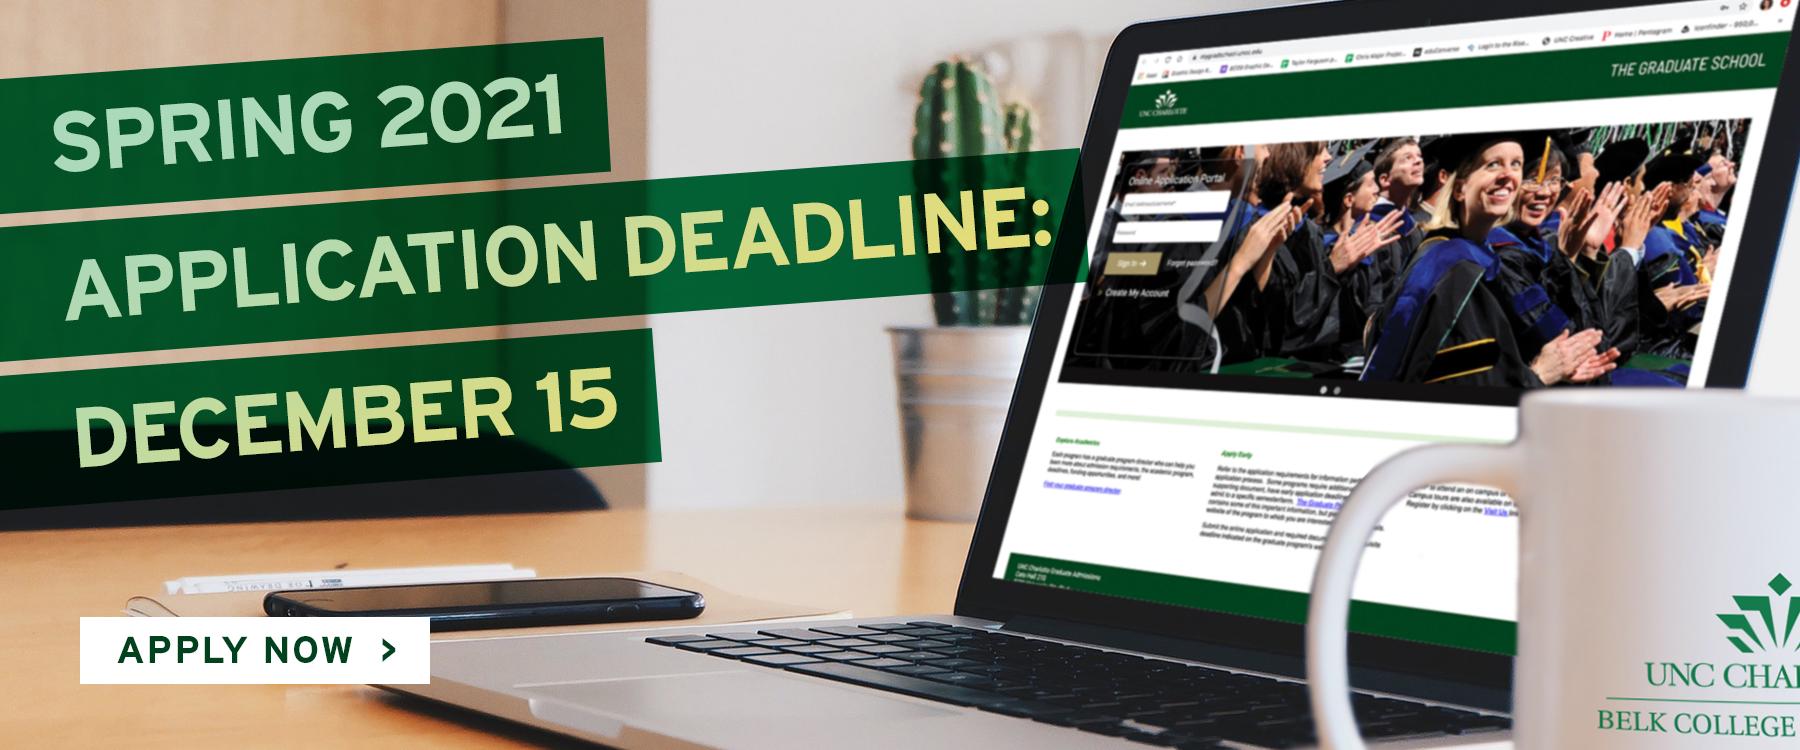 Final Application Deadline Dec. 15